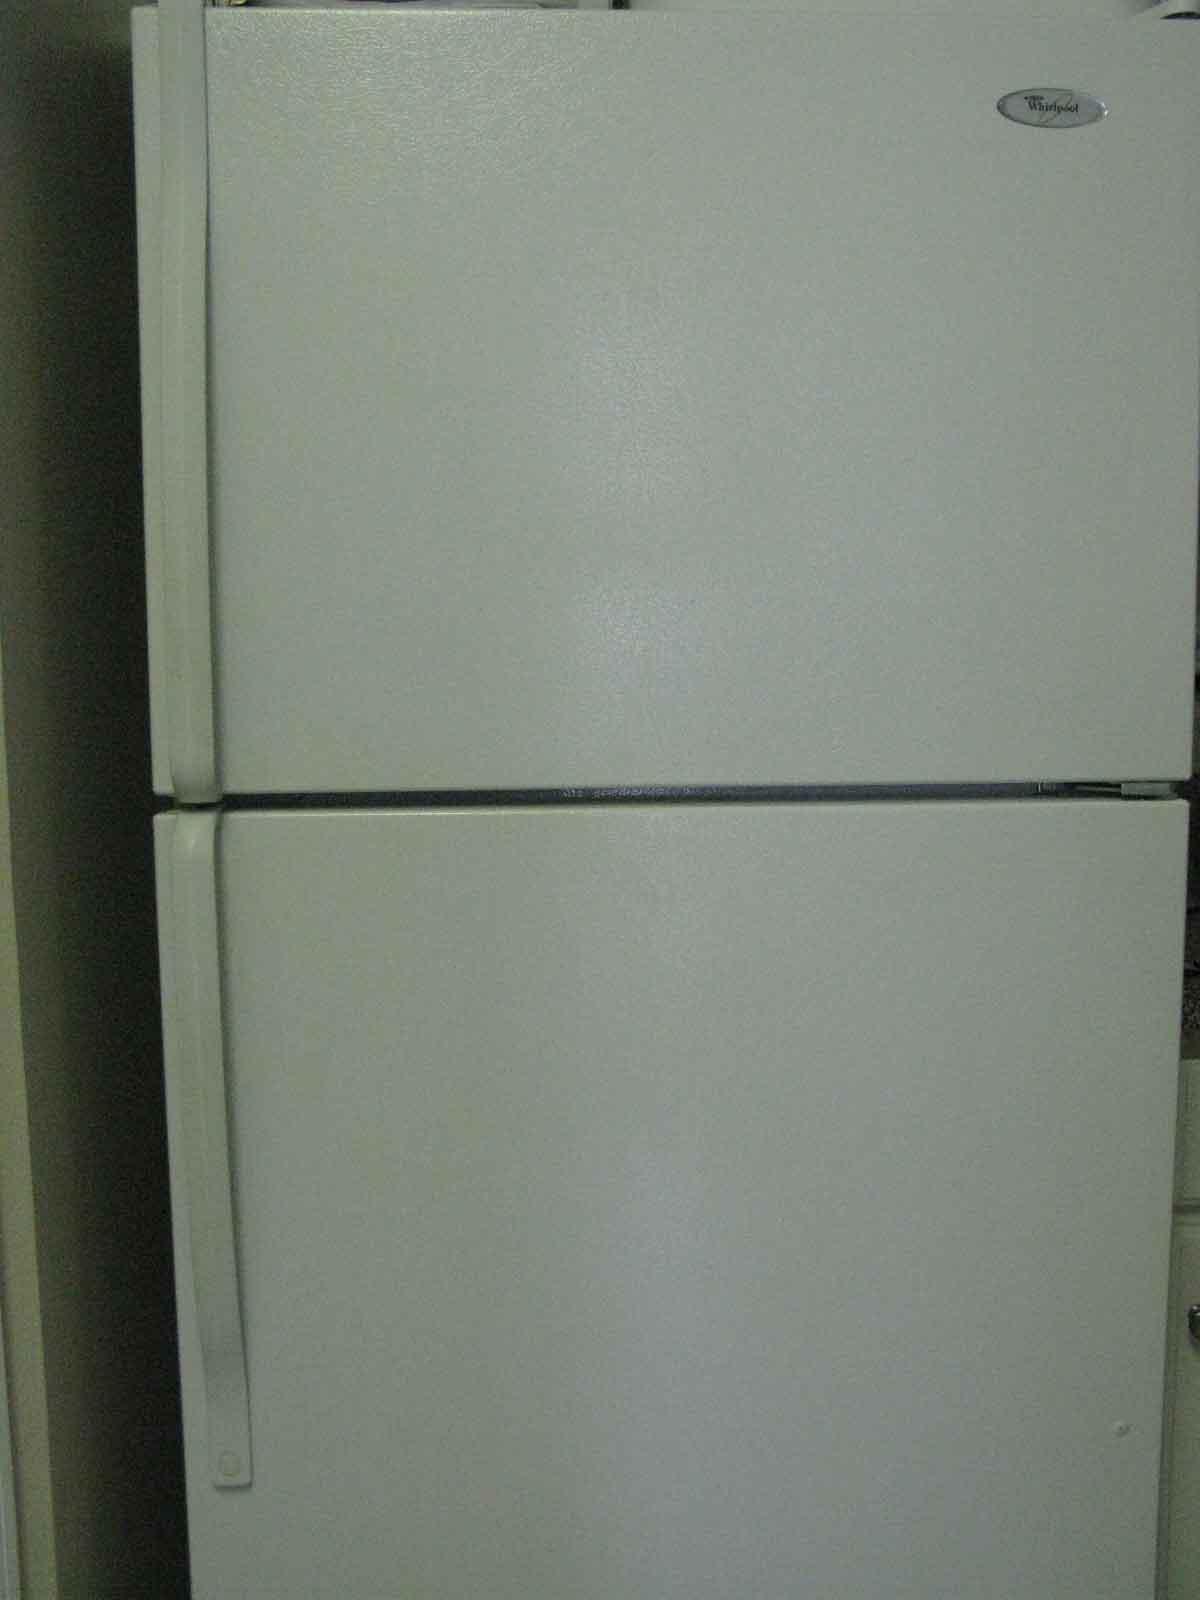 Amana Refrigerator Amana Refrigerator Models In The 1990s